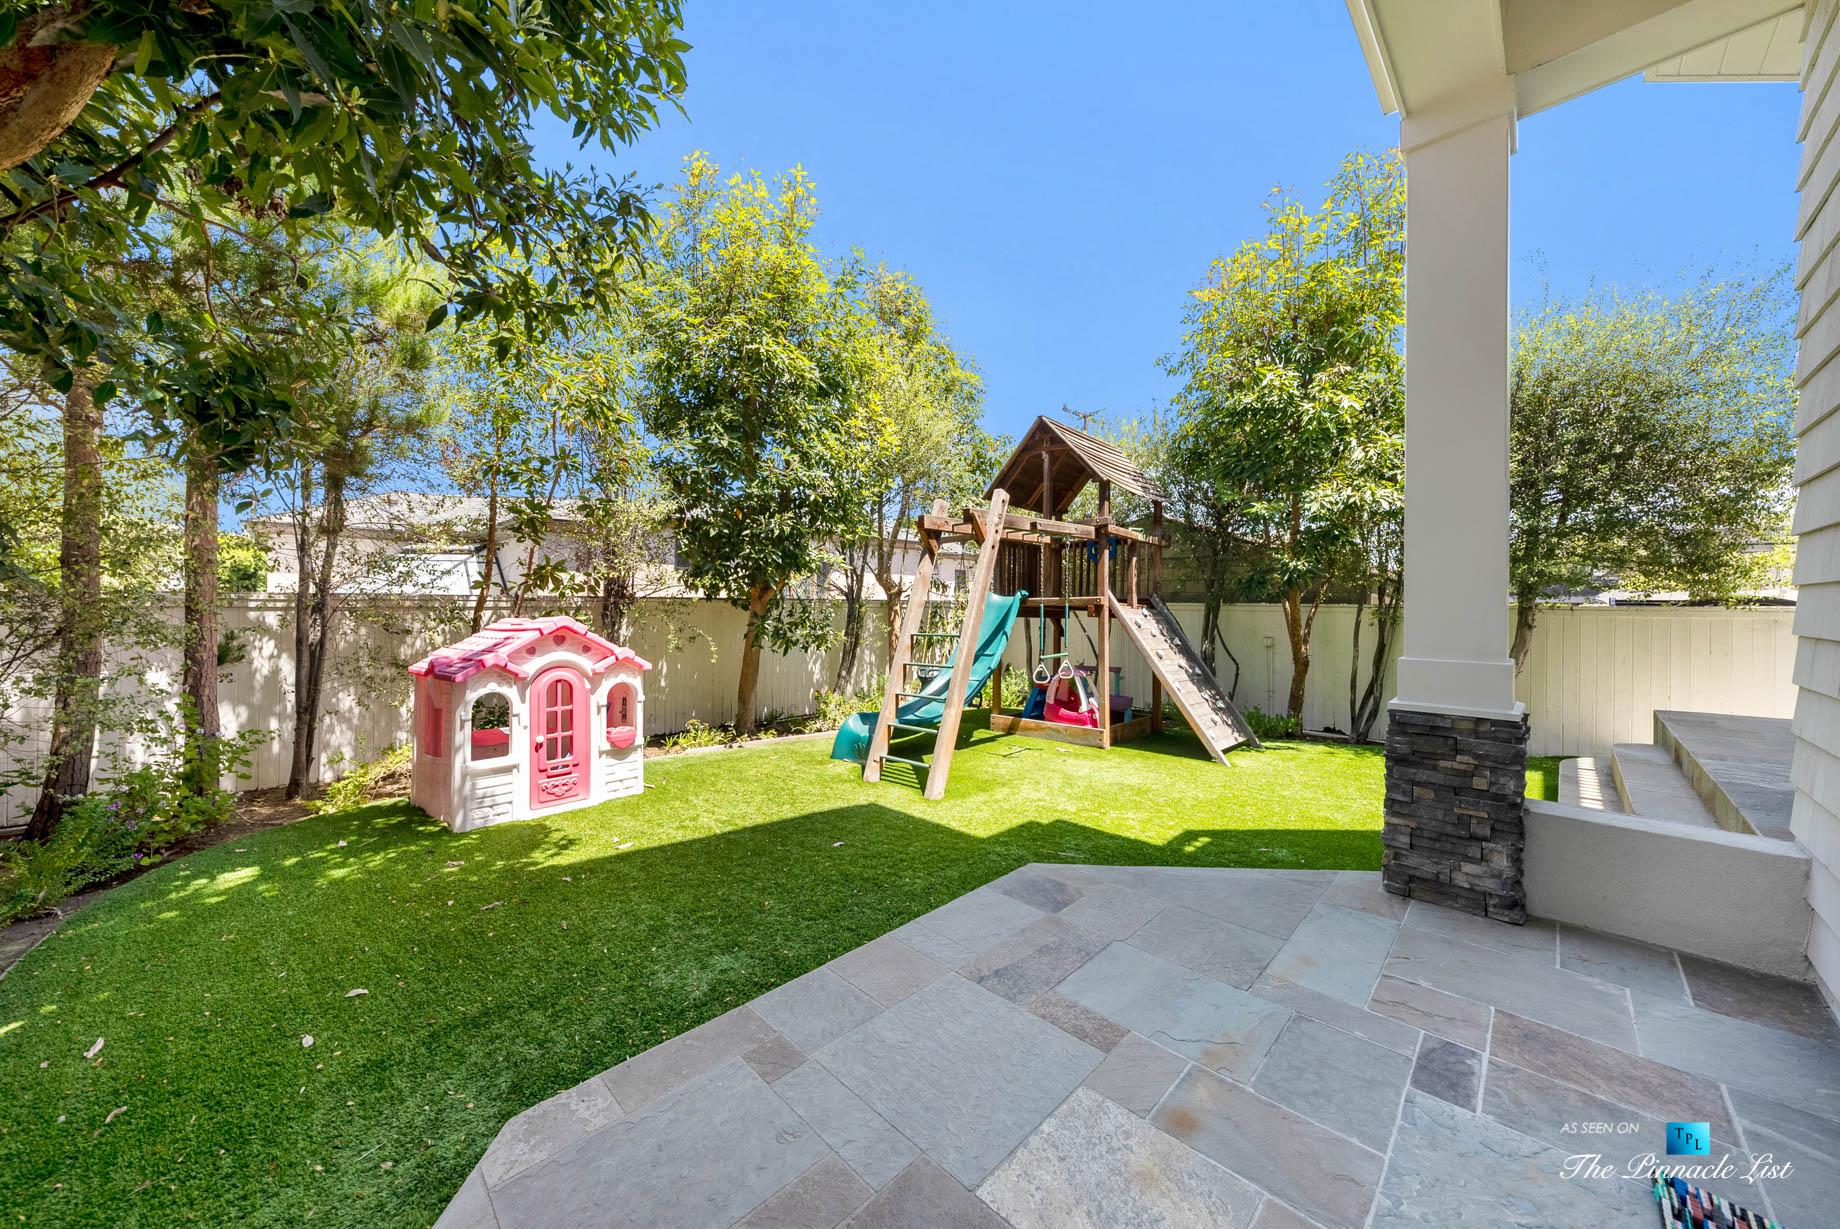 877 8th Street, Manhattan Beach, CA, USA – Backyard